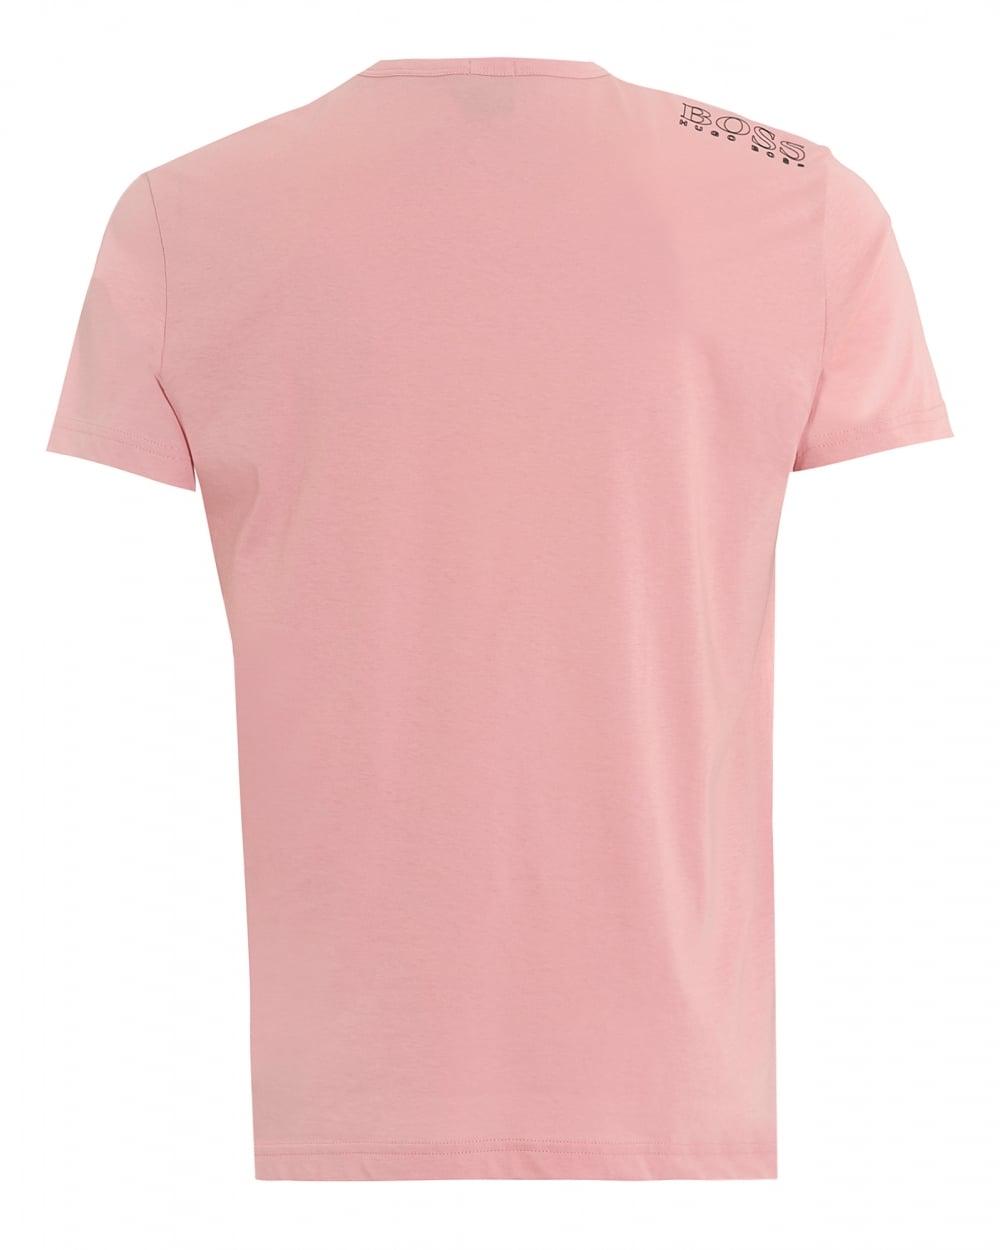 Hugo Boss Green Mens Tee, Plain Basic Rose Pink T-Shirt